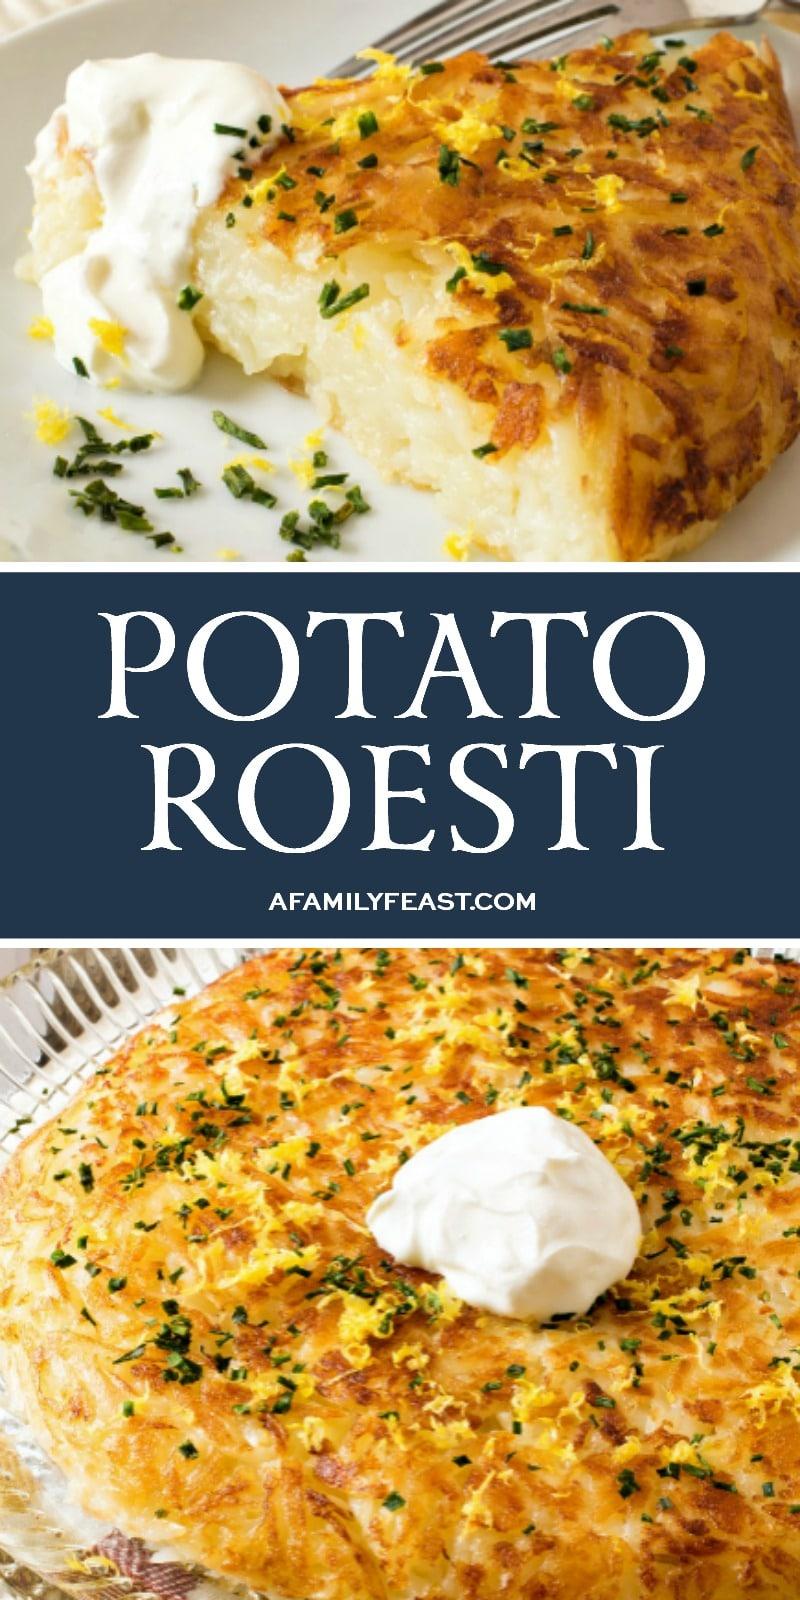 Potato Roesti